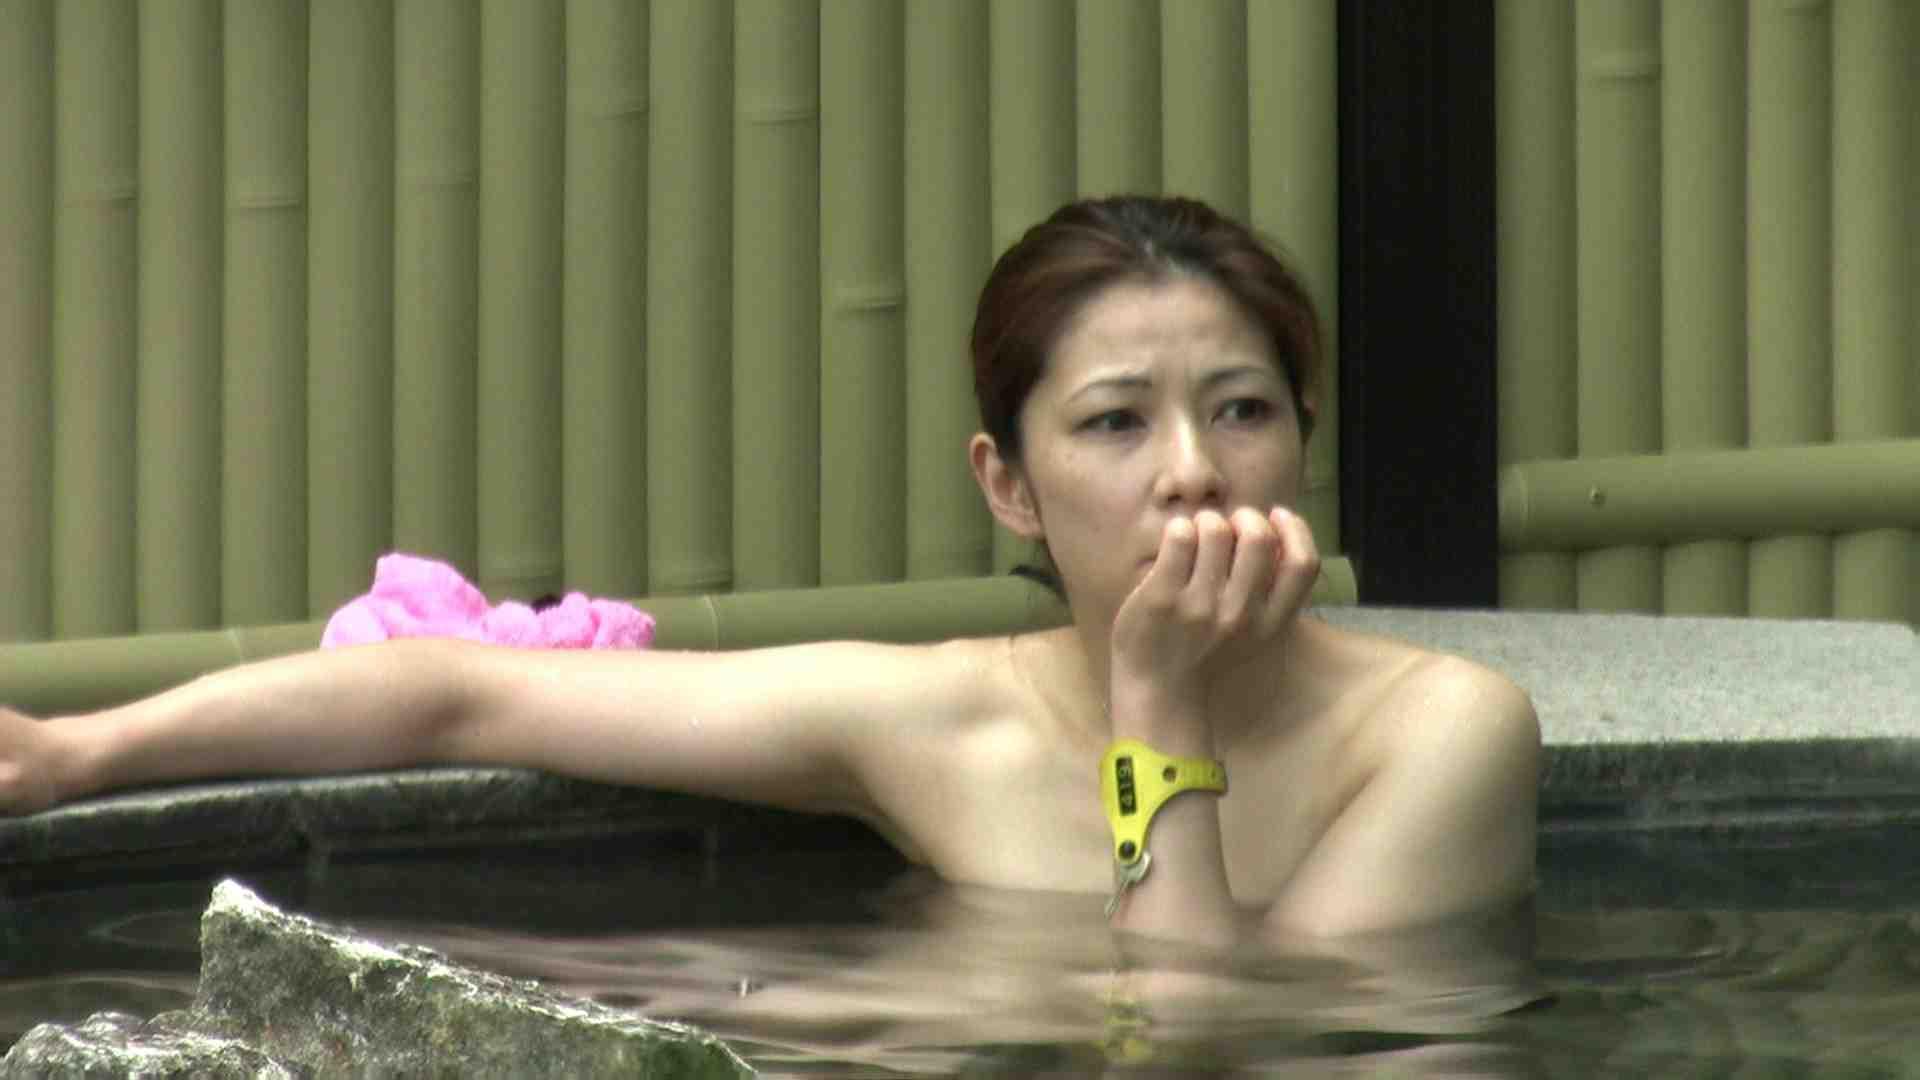 Aquaな露天風呂Vol.660 盗撮 すけべAV動画紹介 66枚 20